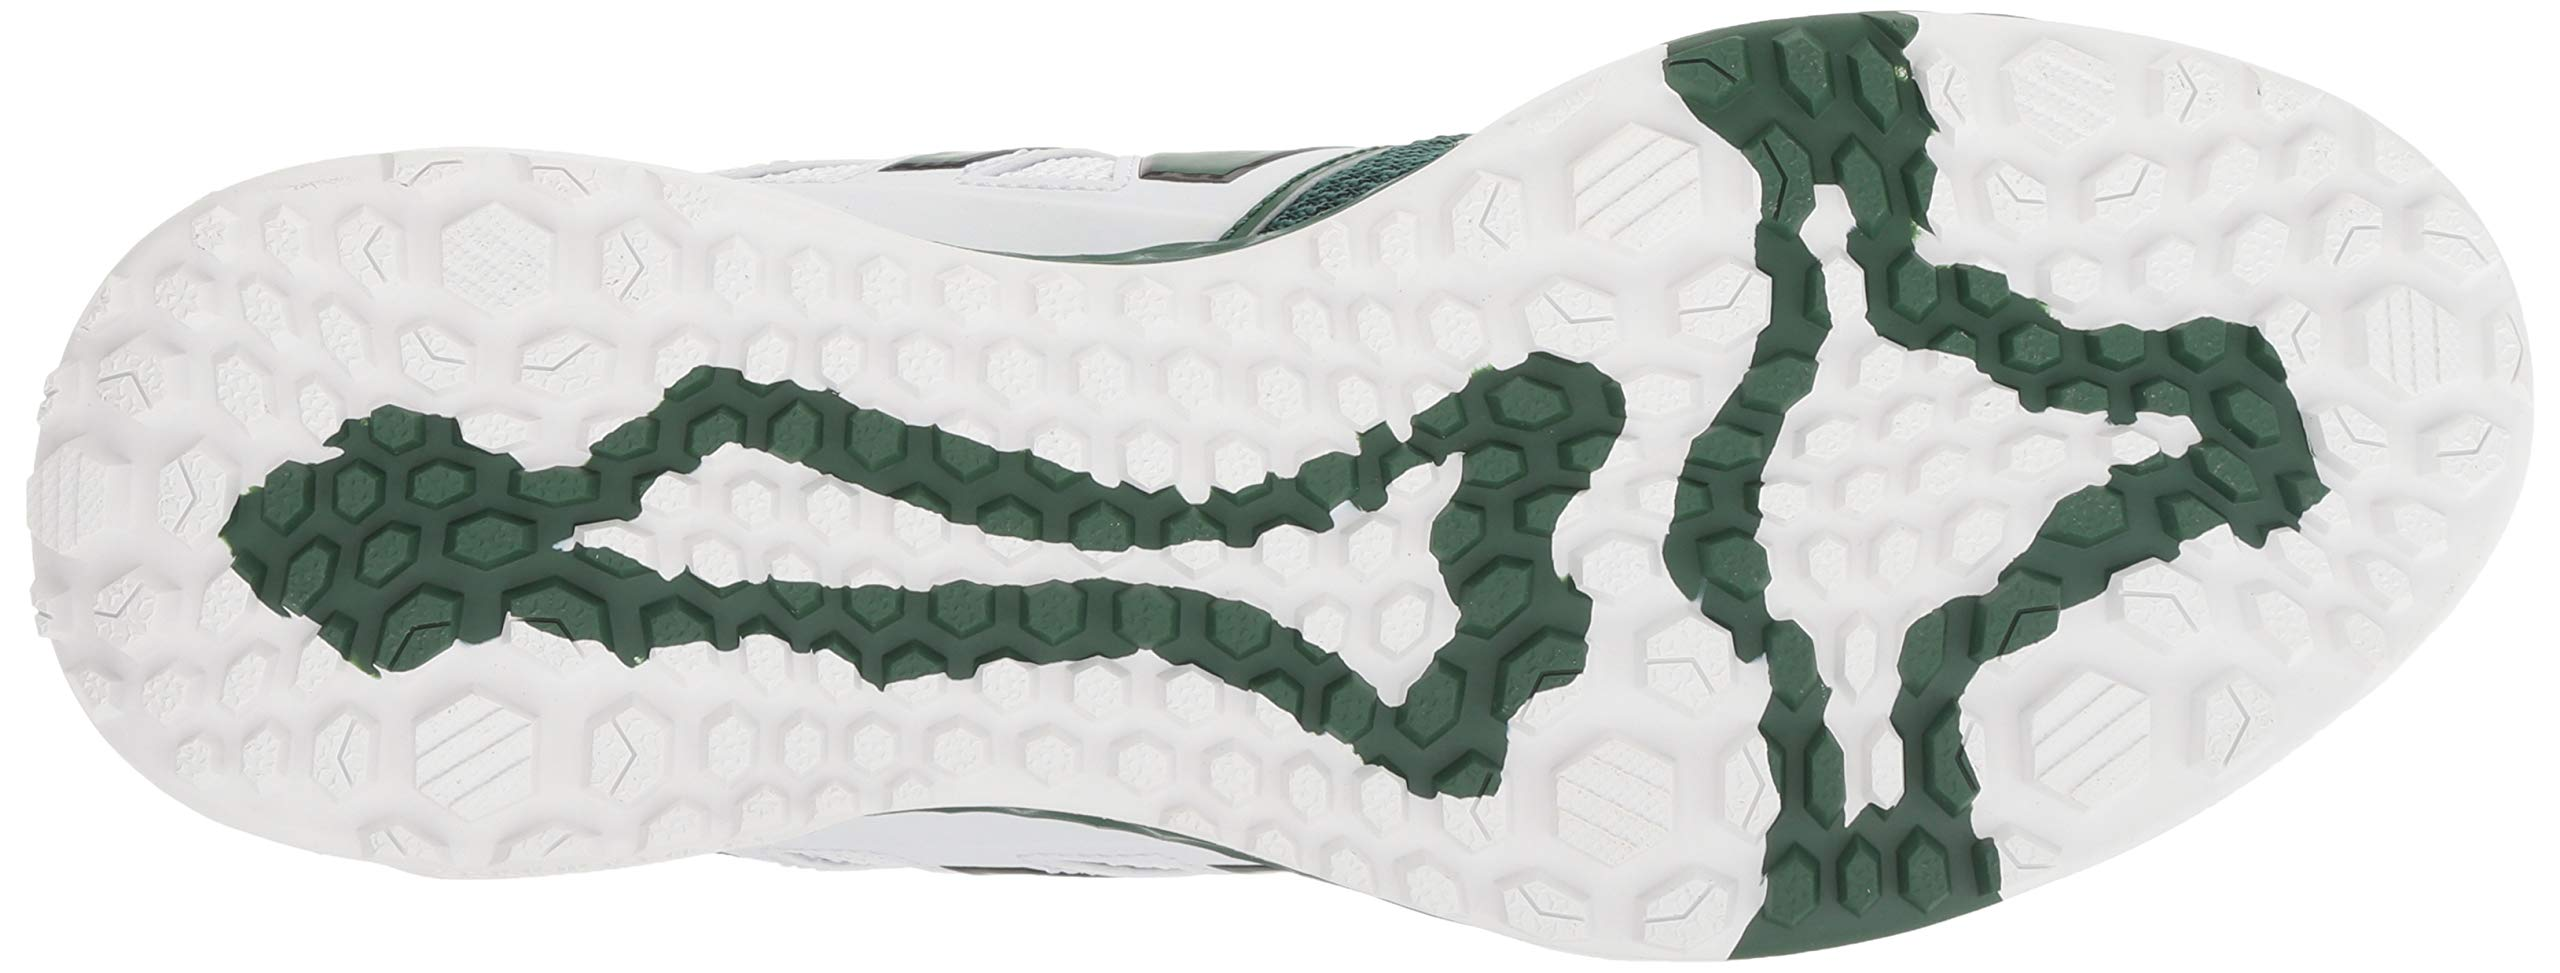 New Balance Men's 3000v4 Turf Baseball Shoe, Green/White, 5 D US by New Balance (Image #3)